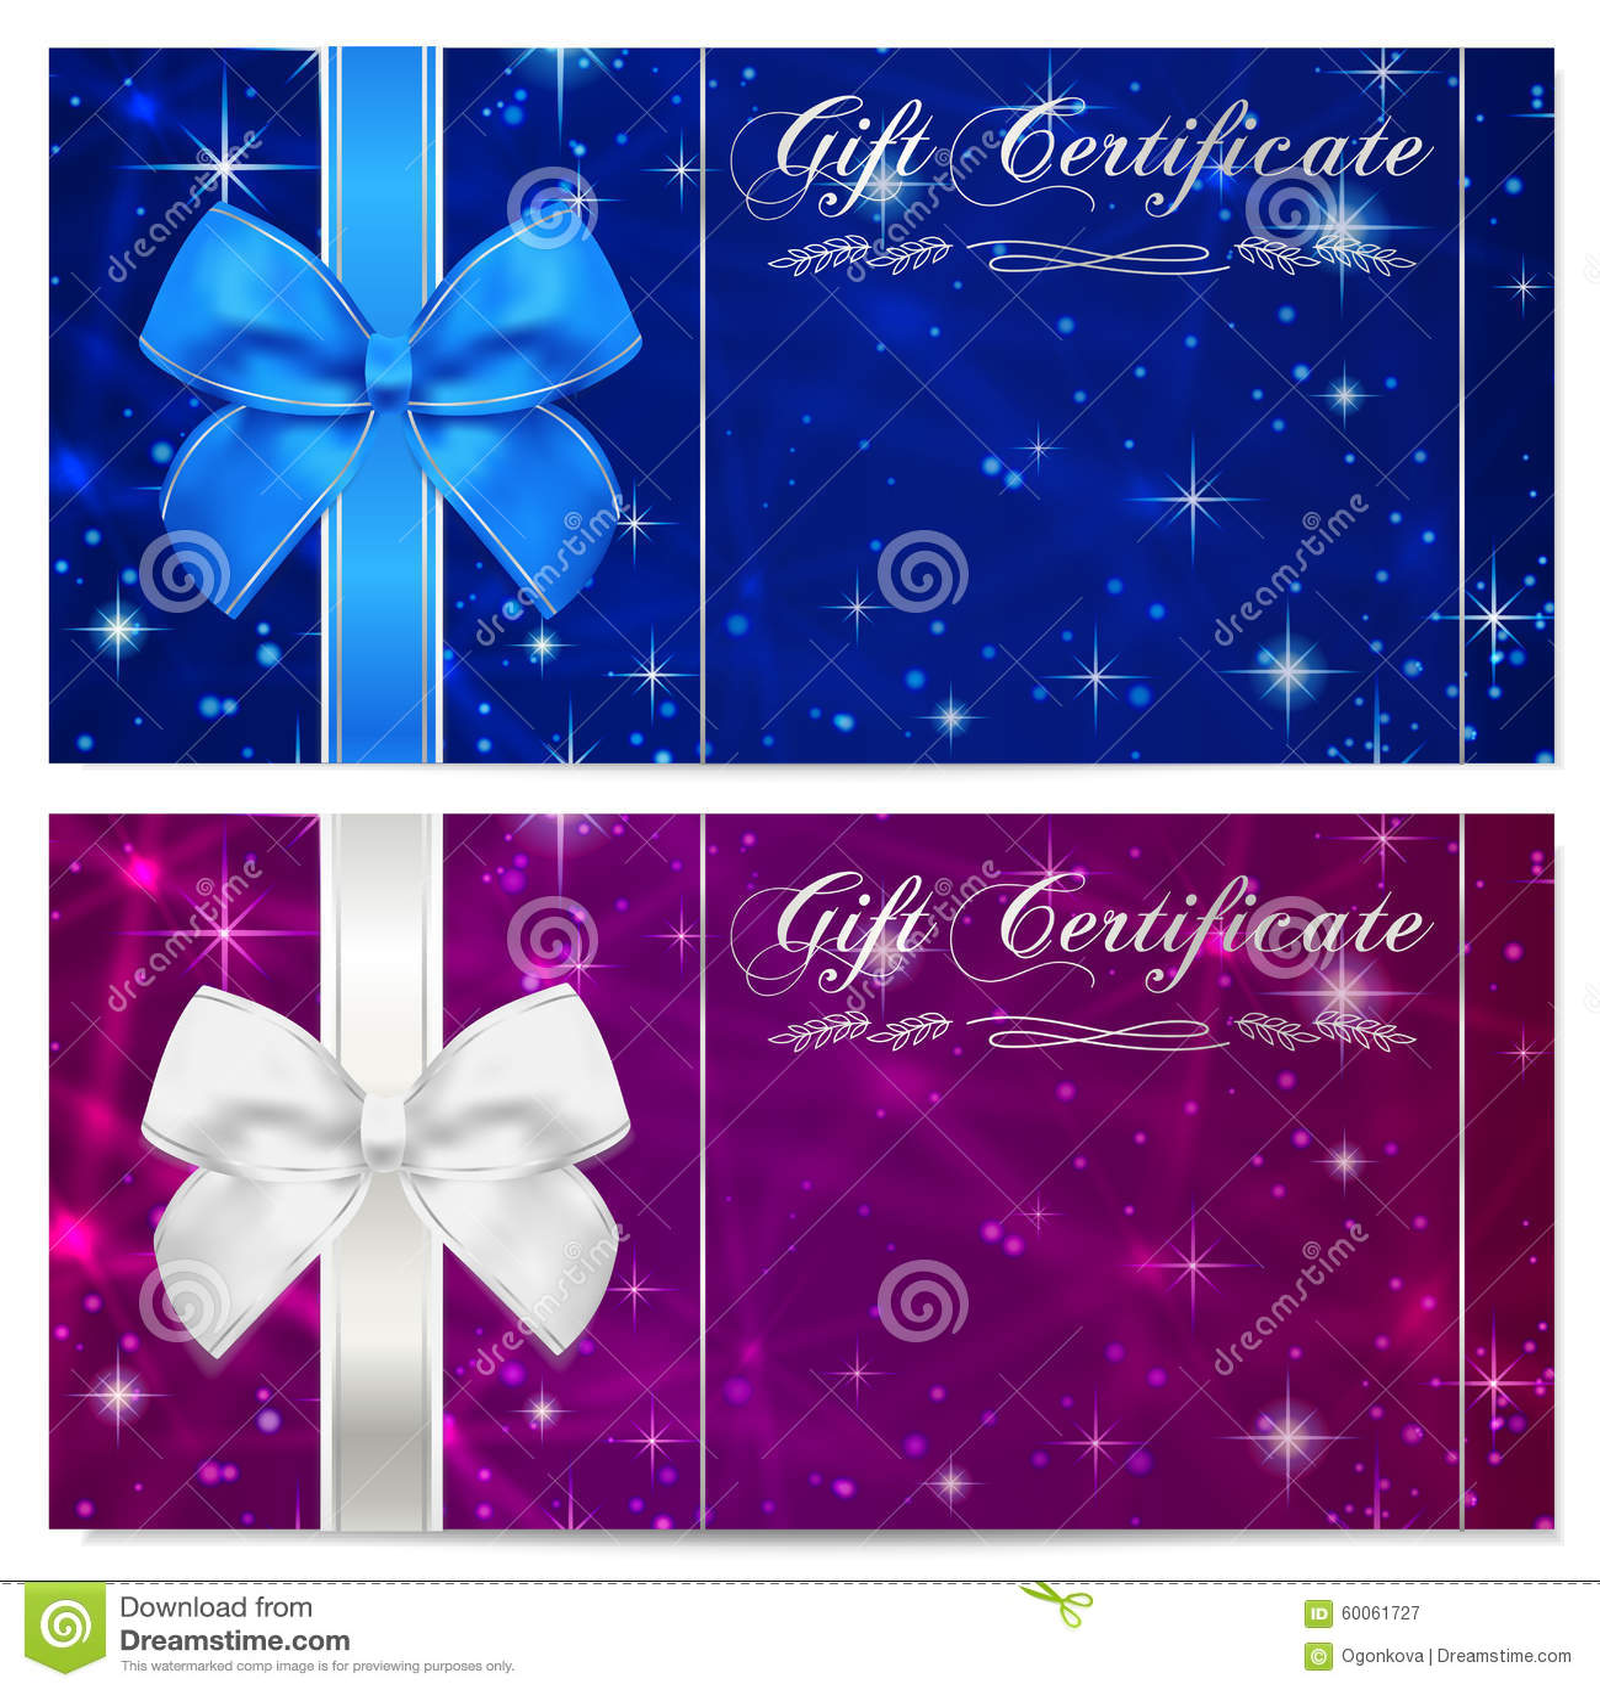 gift card template - solarfm.tk